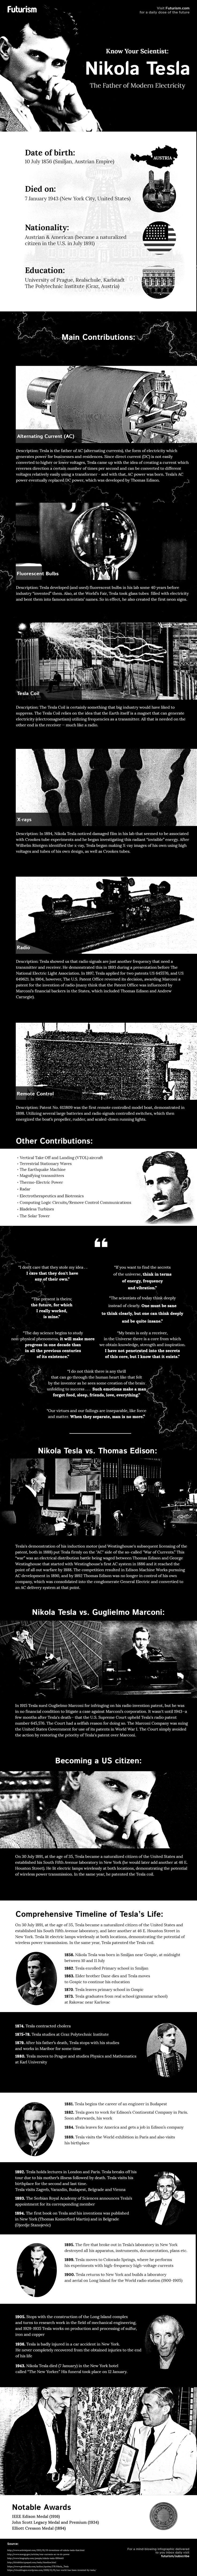 Nikola Tesla Infographic  (Mira M Nikola Tesla was Serbian, born in Croatia to Serbian Parents, in the country of Yugoslavia )